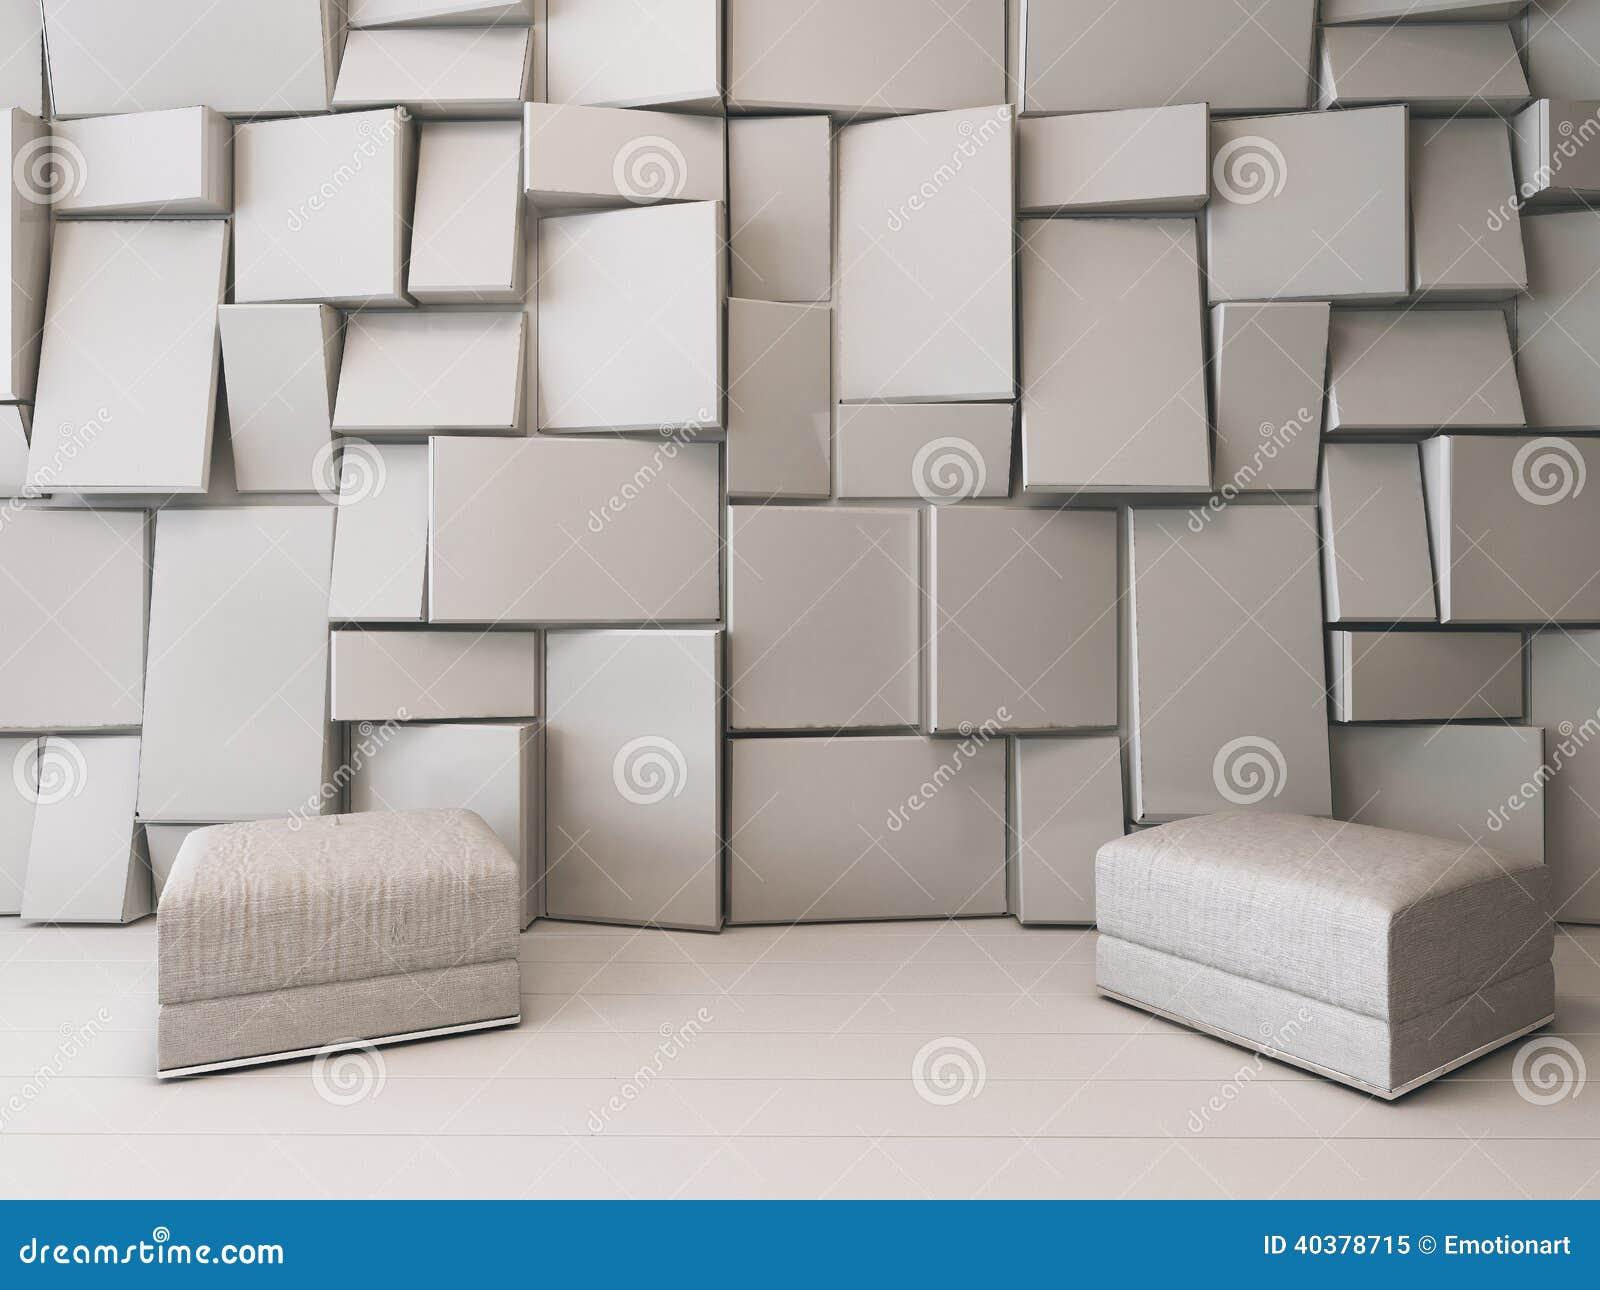 wei er leerer raum mit rechteckigen fliesen stockfoto bild 40378715. Black Bedroom Furniture Sets. Home Design Ideas